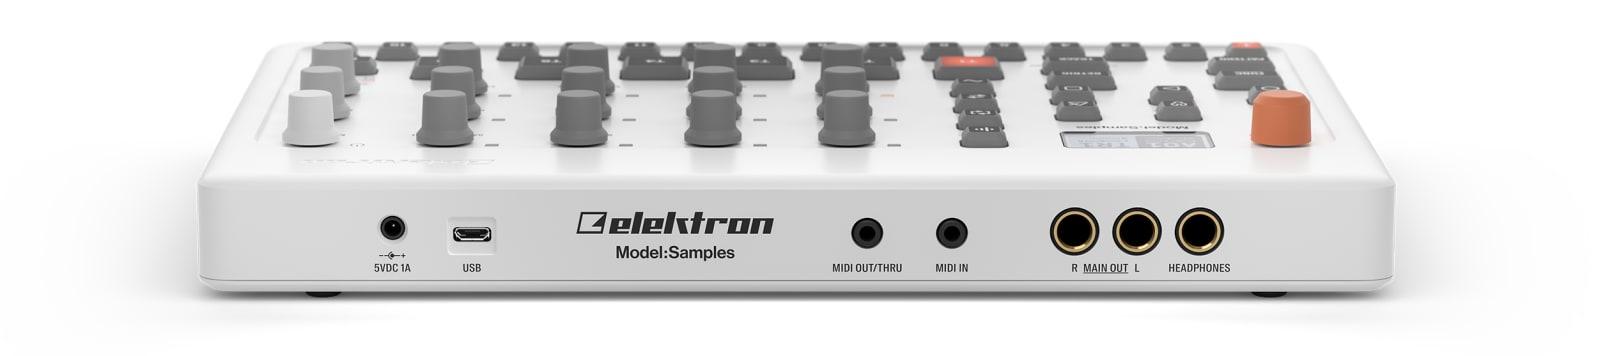 Elektron Model:Samples back